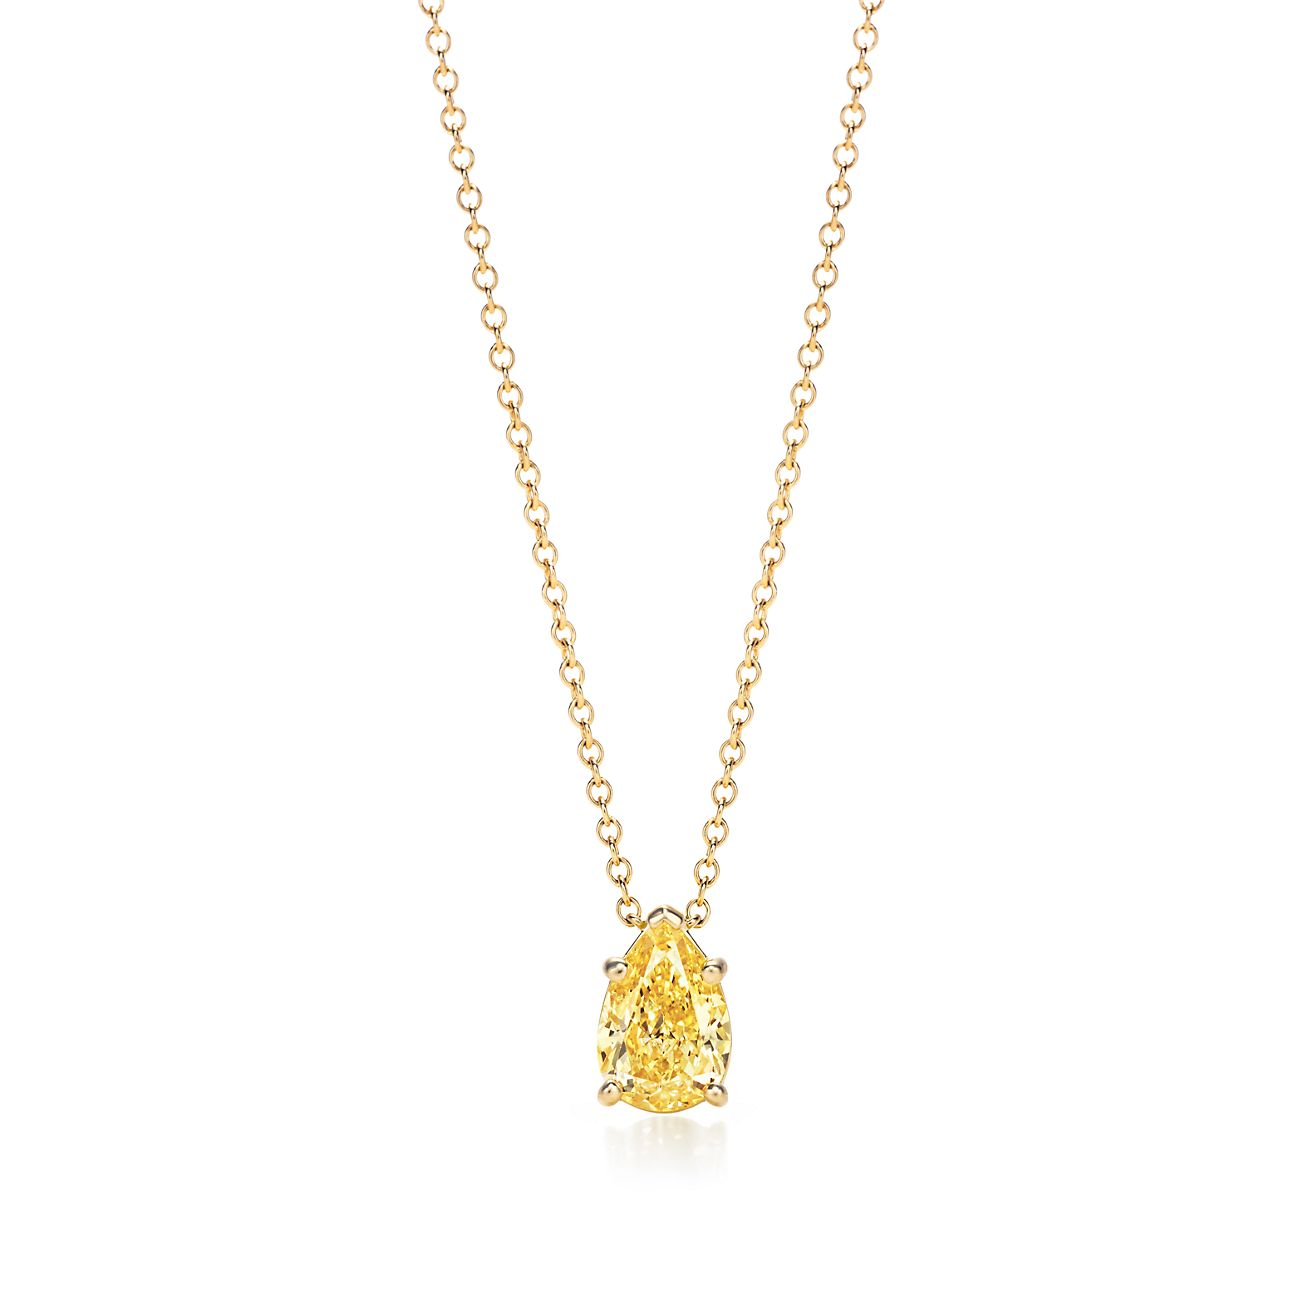 Pear shaped tiffany yellow diamond pendant in 18k gold tiffany co pear shaped yellow diamond pendant aloadofball Gallery